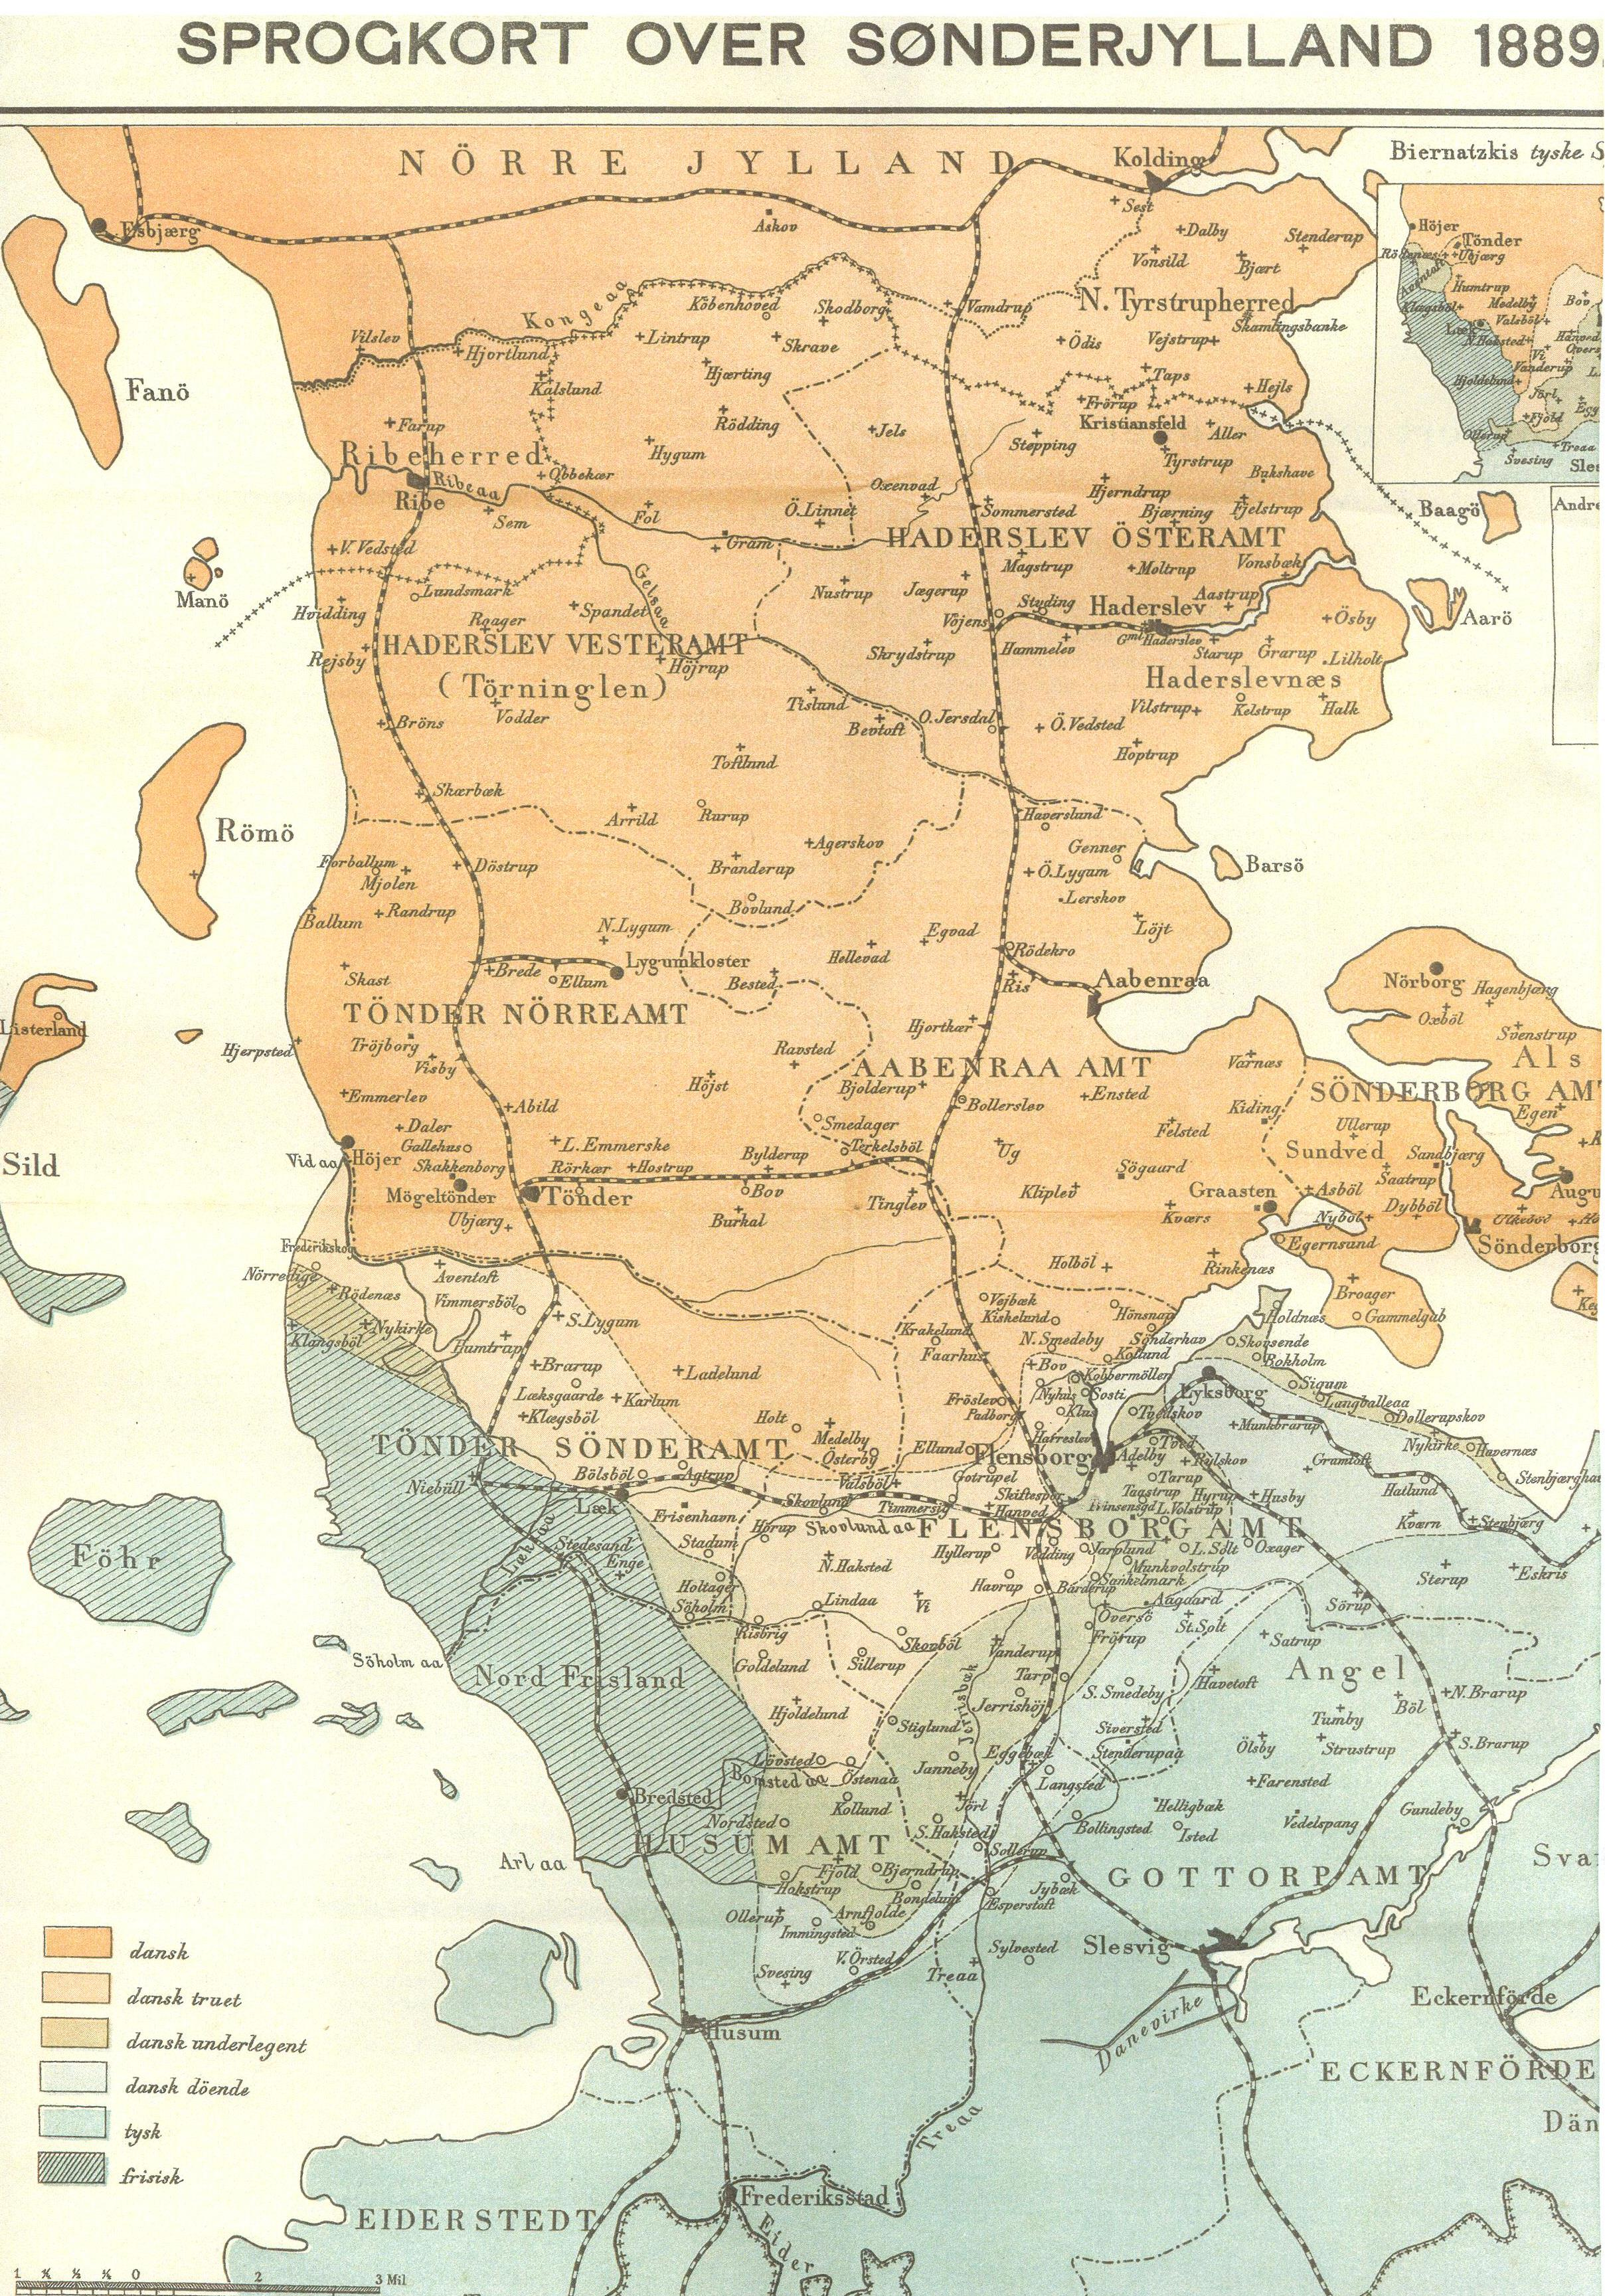 File Sprogkort Sonderjylland 1889 Jpg Wikimedia Commons